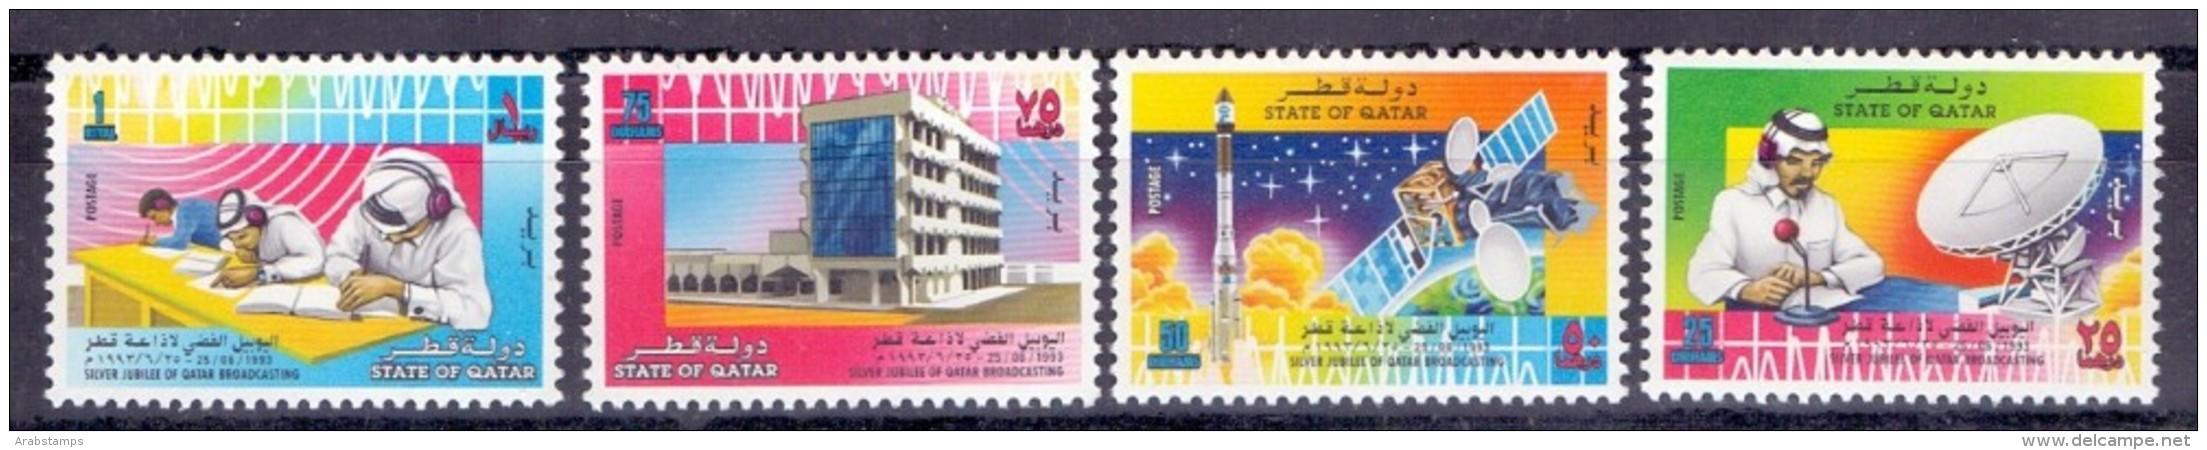 1993 QATAR Silver Jubilee Of Qatar Broadcasting. Complete Set 4 Values (MNH) - Qatar